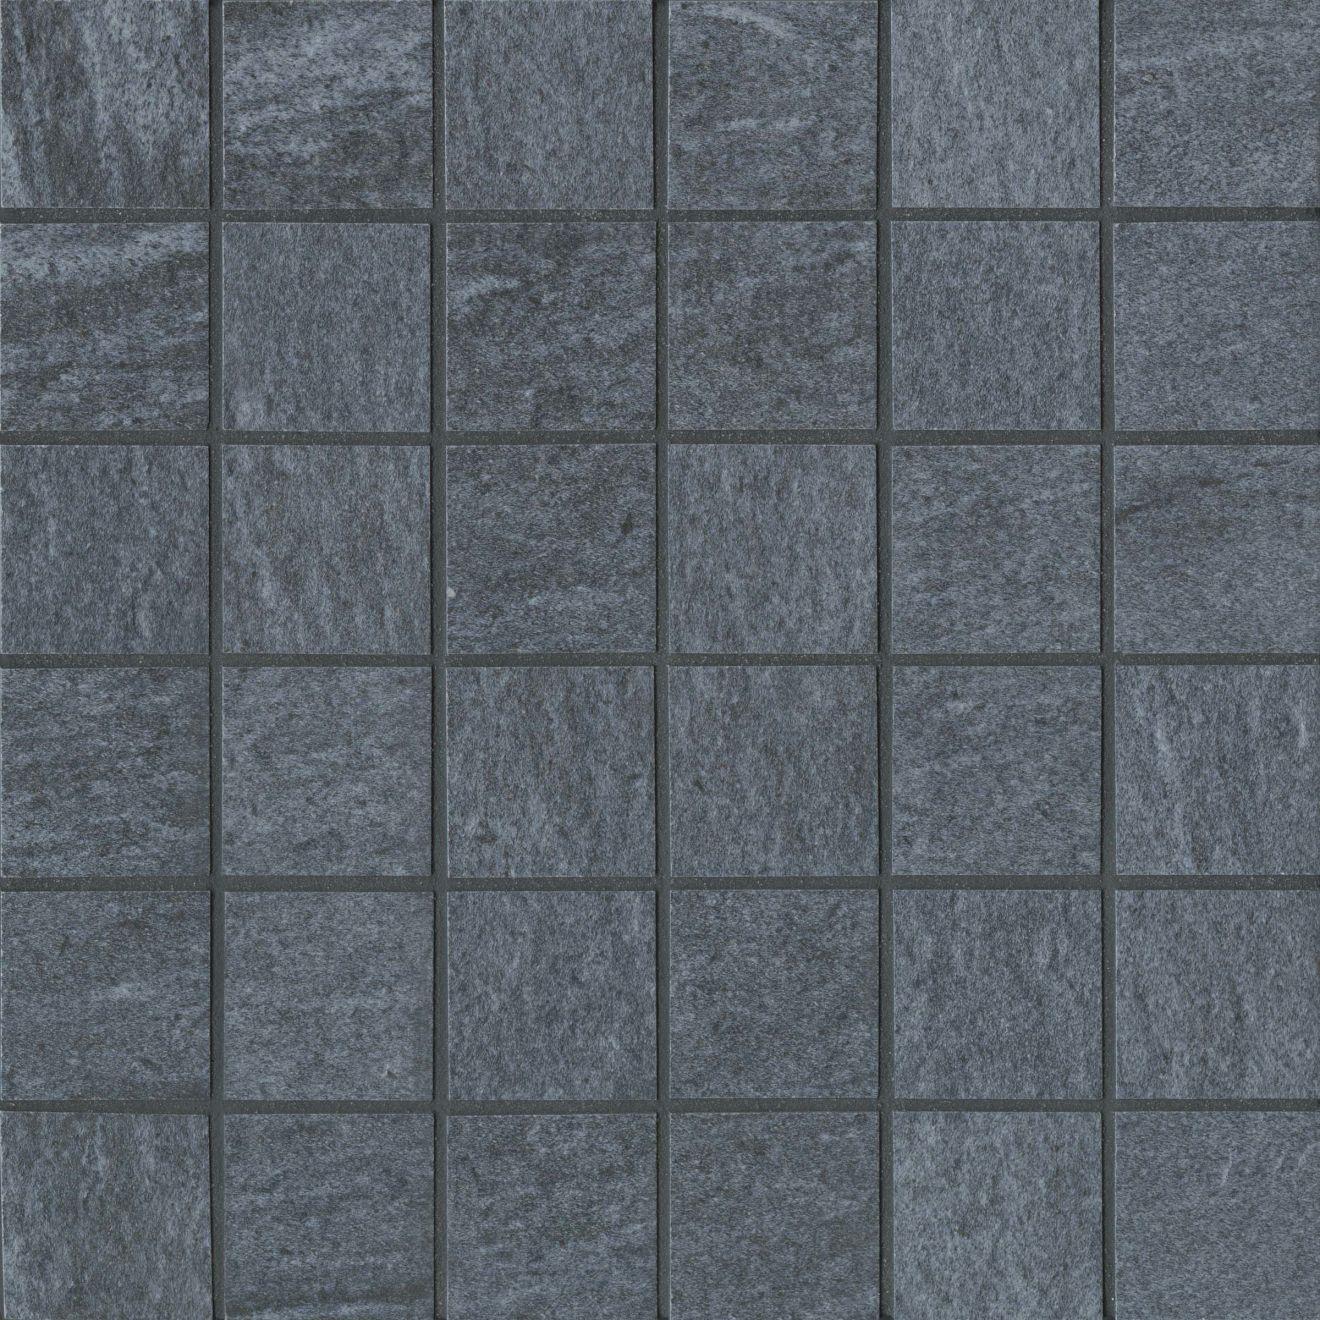 "Urban 2.0 2"" x 2"" Floor & Wall Mosaic in Raven Black"